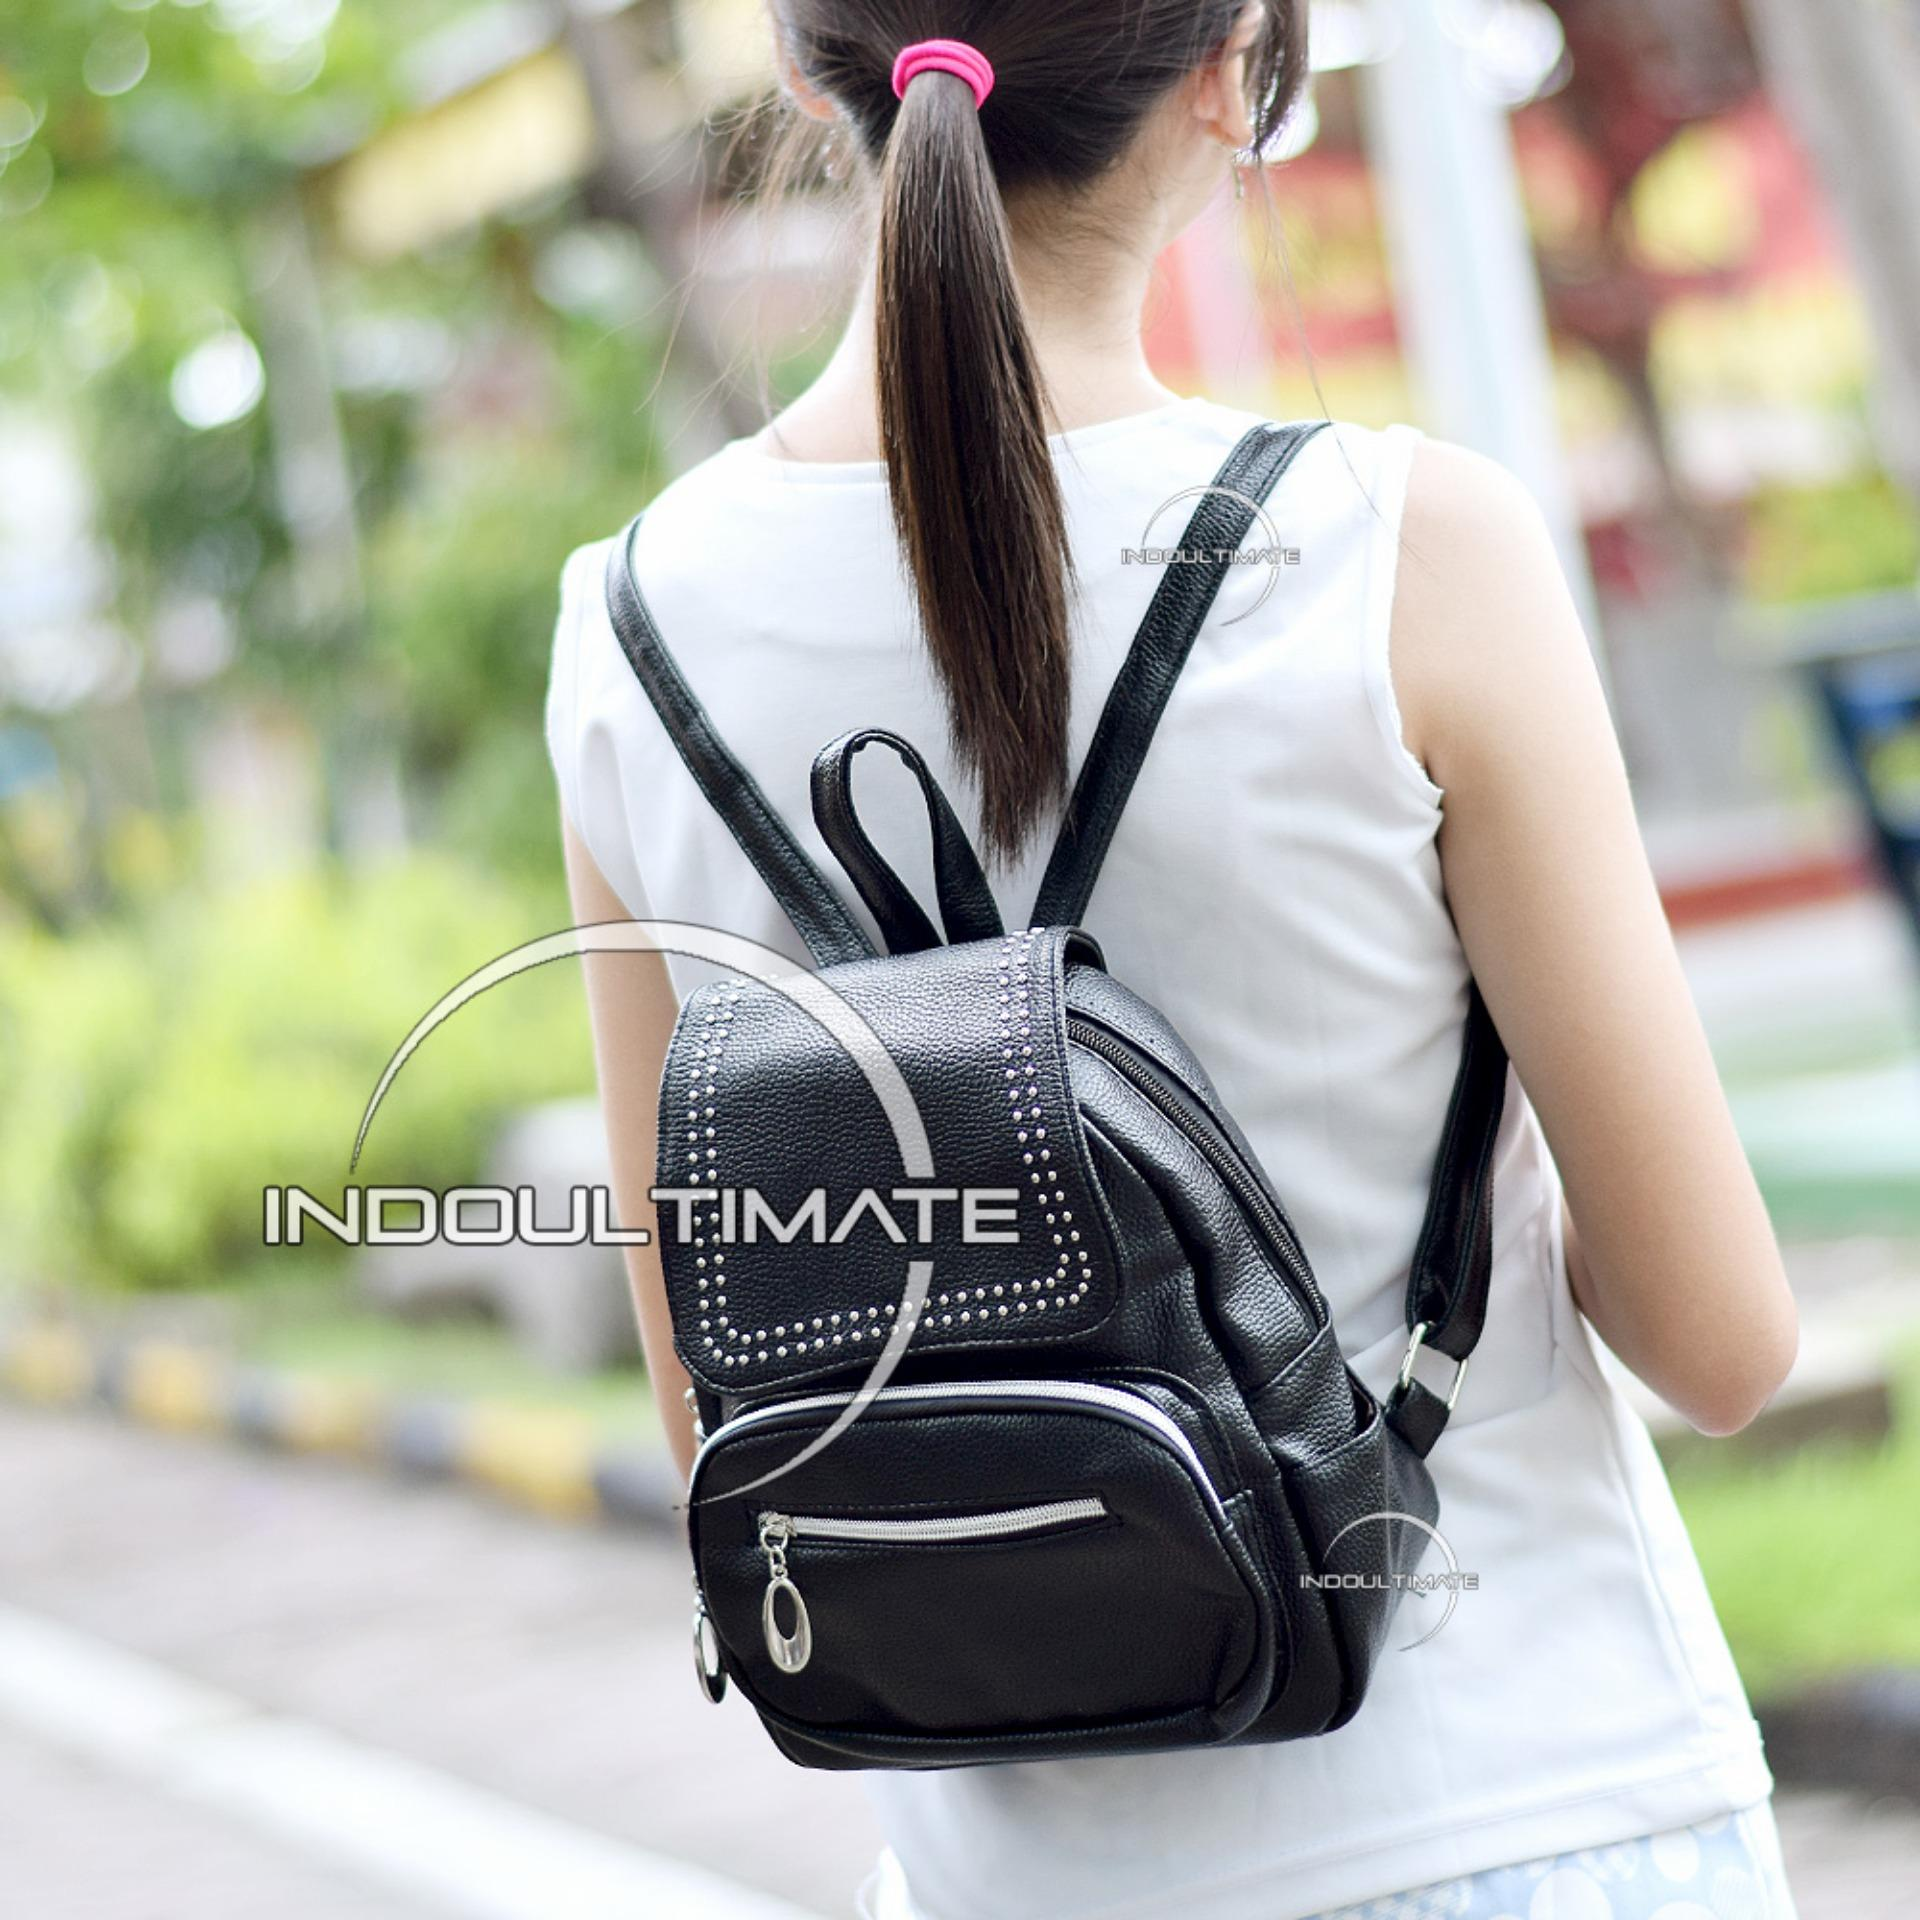 Ulasan Lengkap Tentang Tas Ransel Wanita Tas Fashion Import Im Fs Jn 3303 Backpack Cewek Import